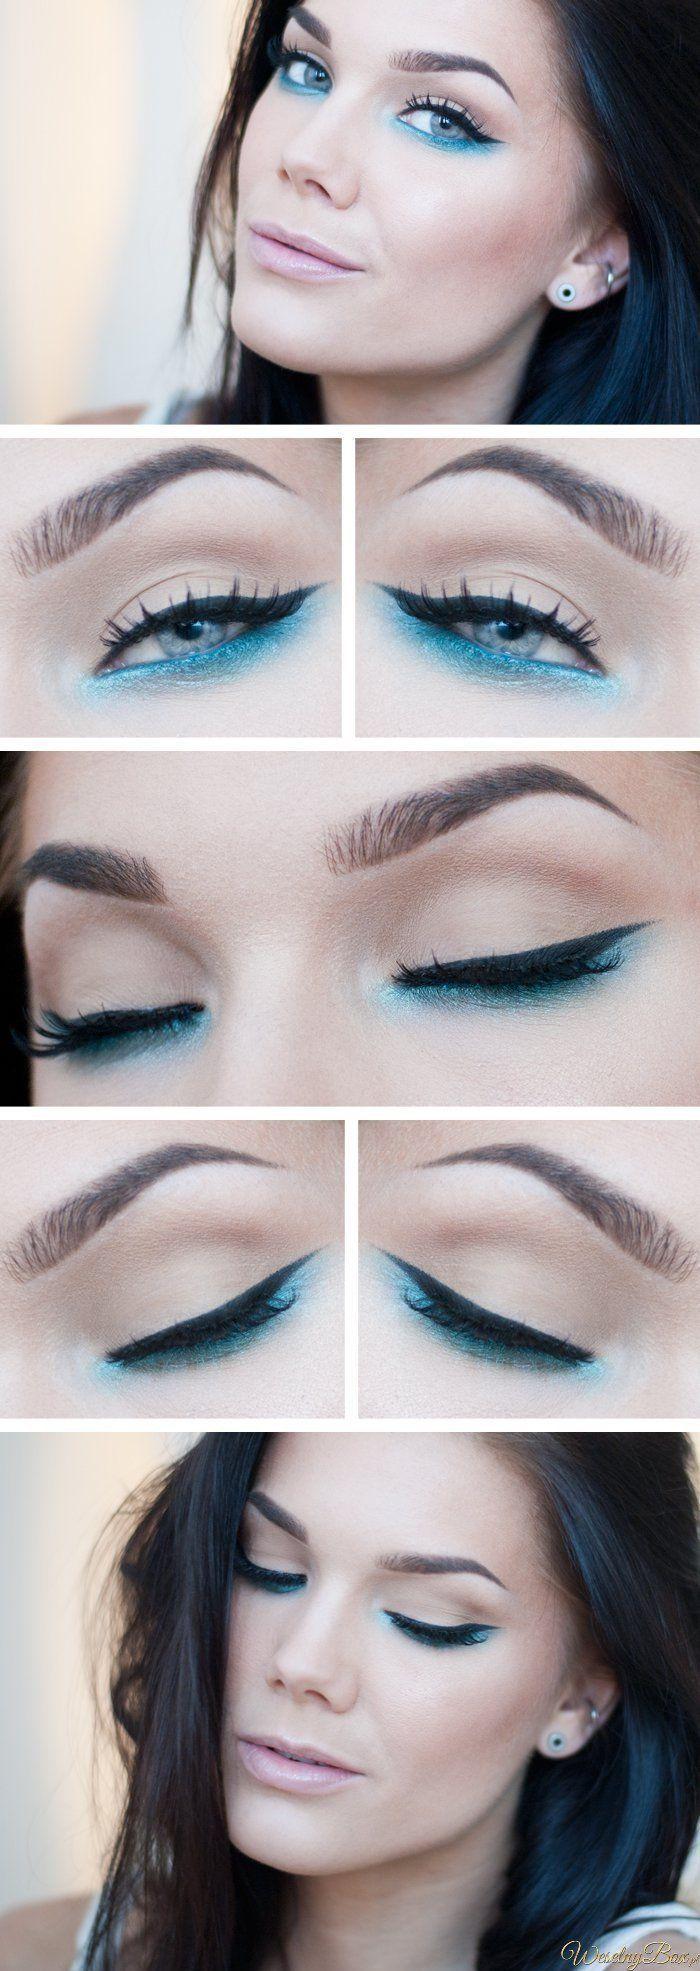 BangerBeauty: Linda Hallberg- Winged Eyeliner w/Blue Shimmer on Bottom Line